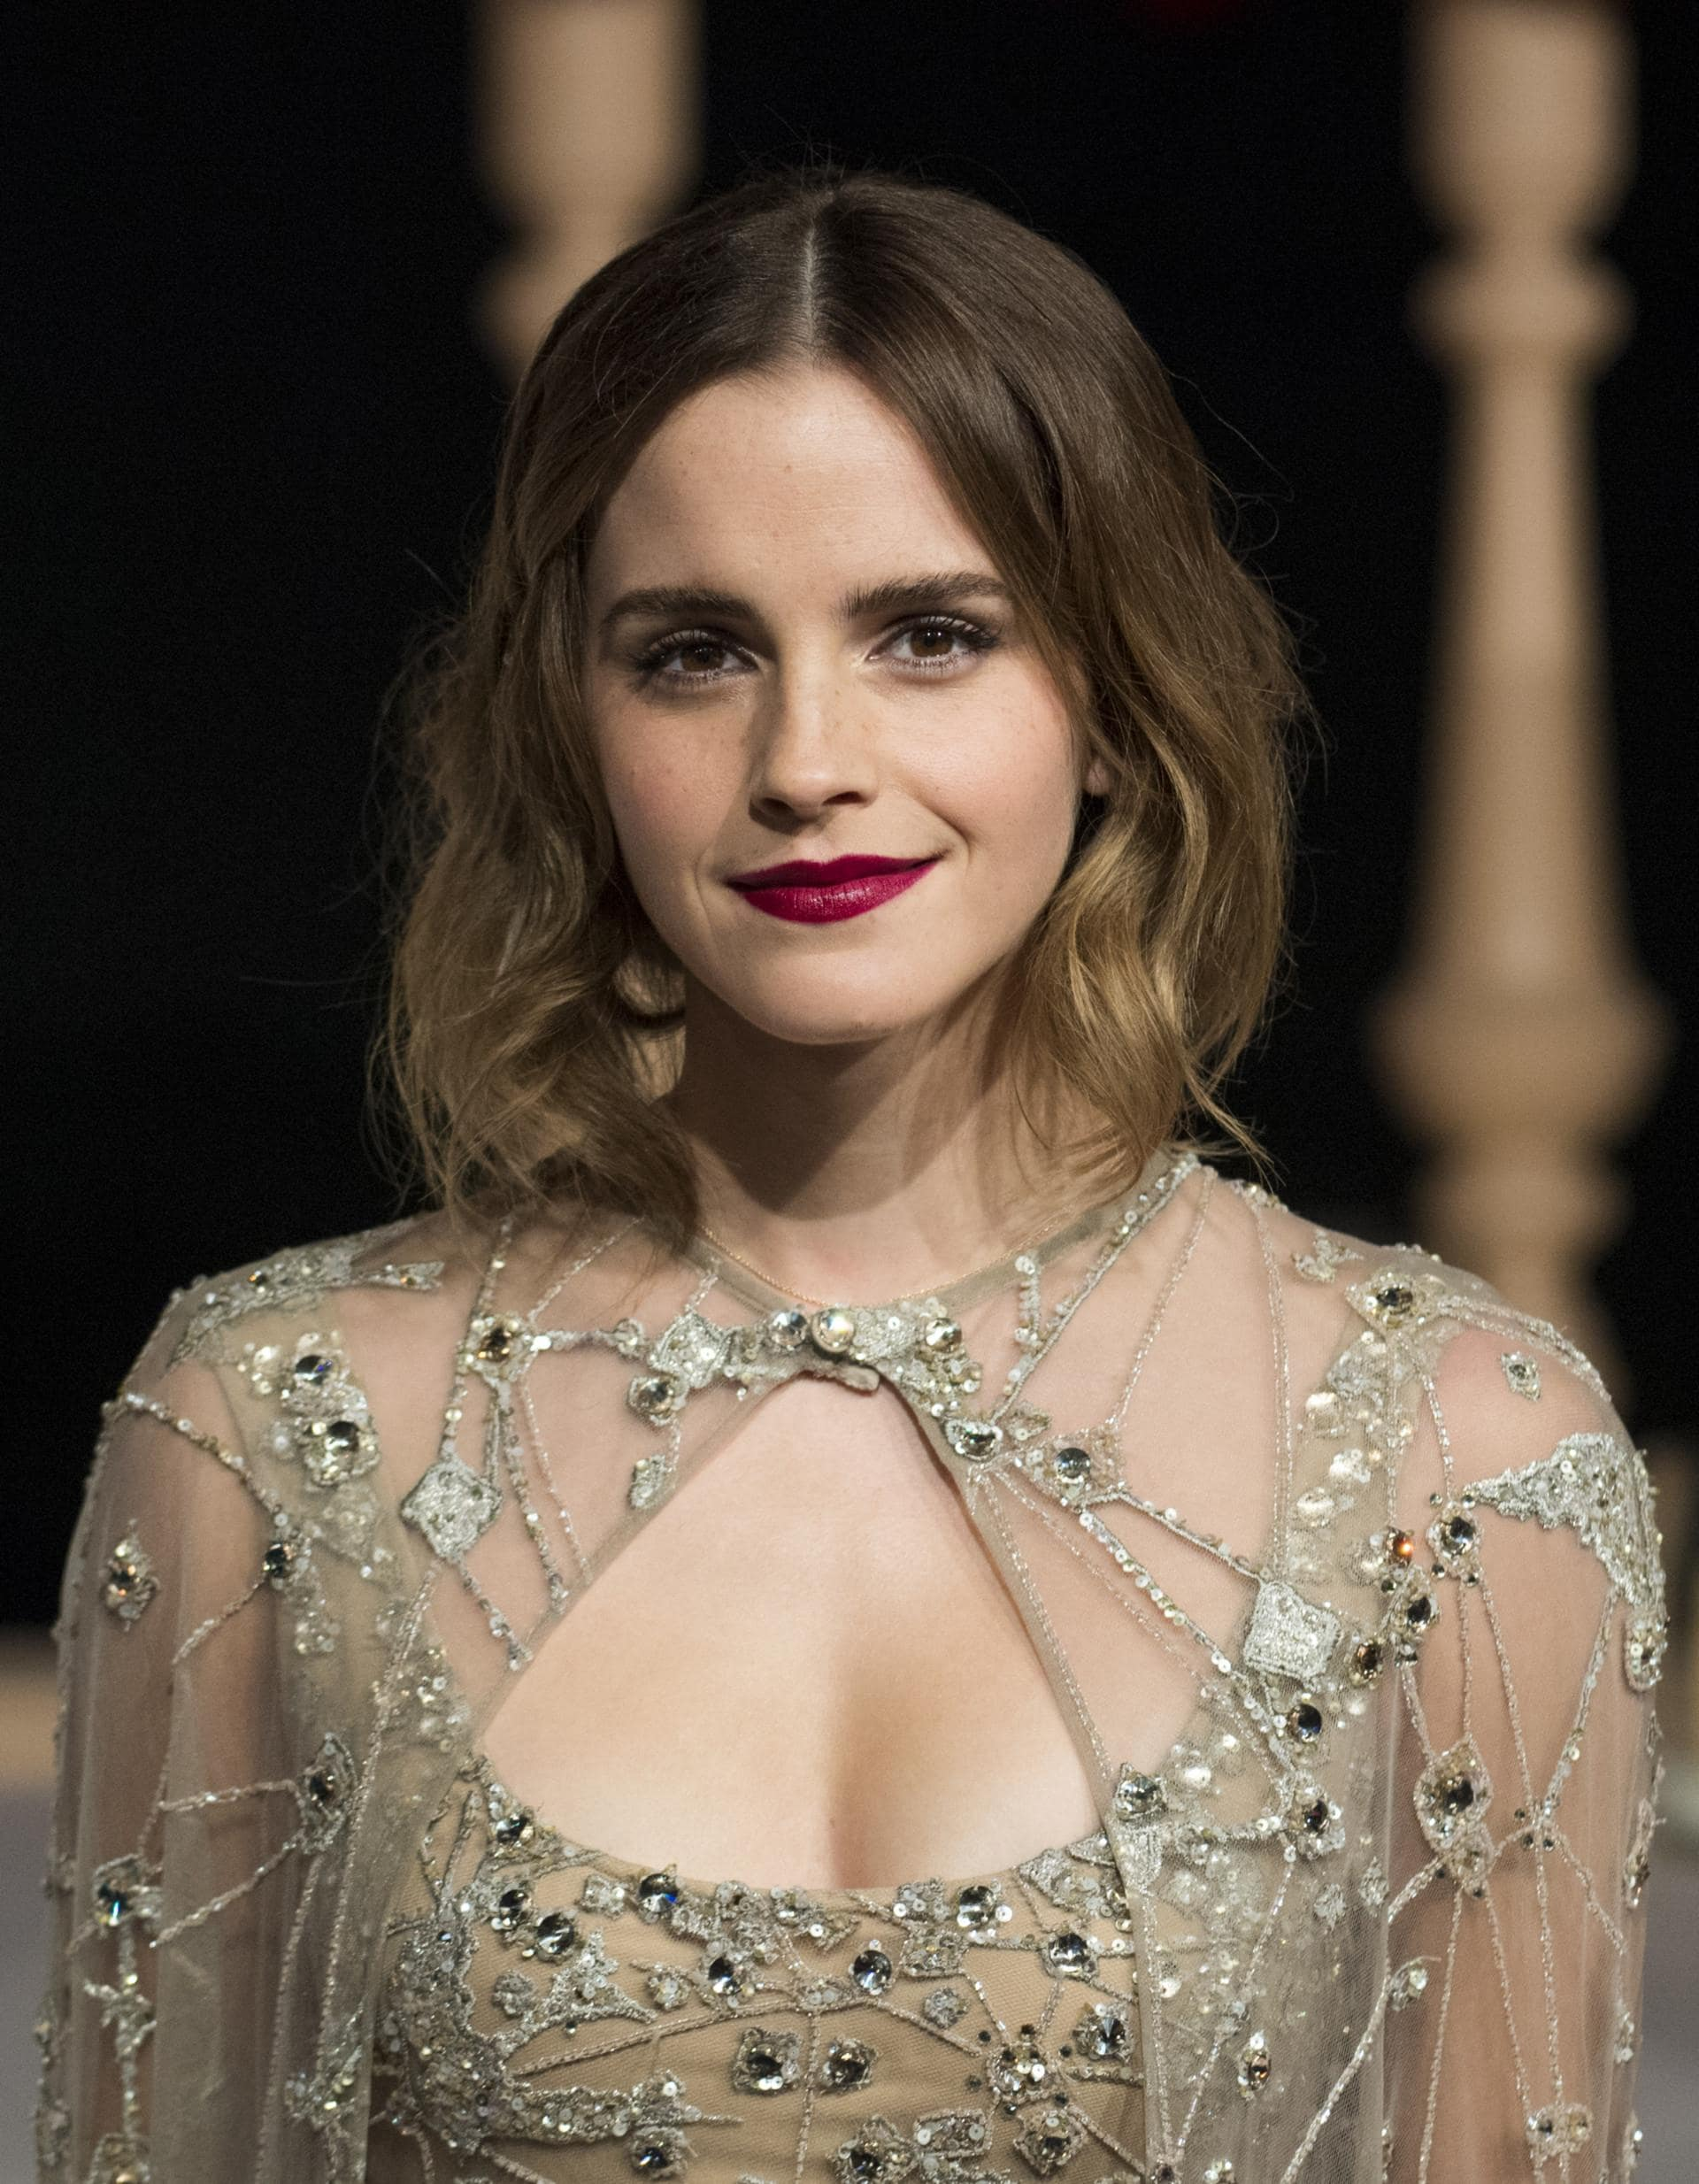 The Hottest Emma Watson Photos - Barnorama